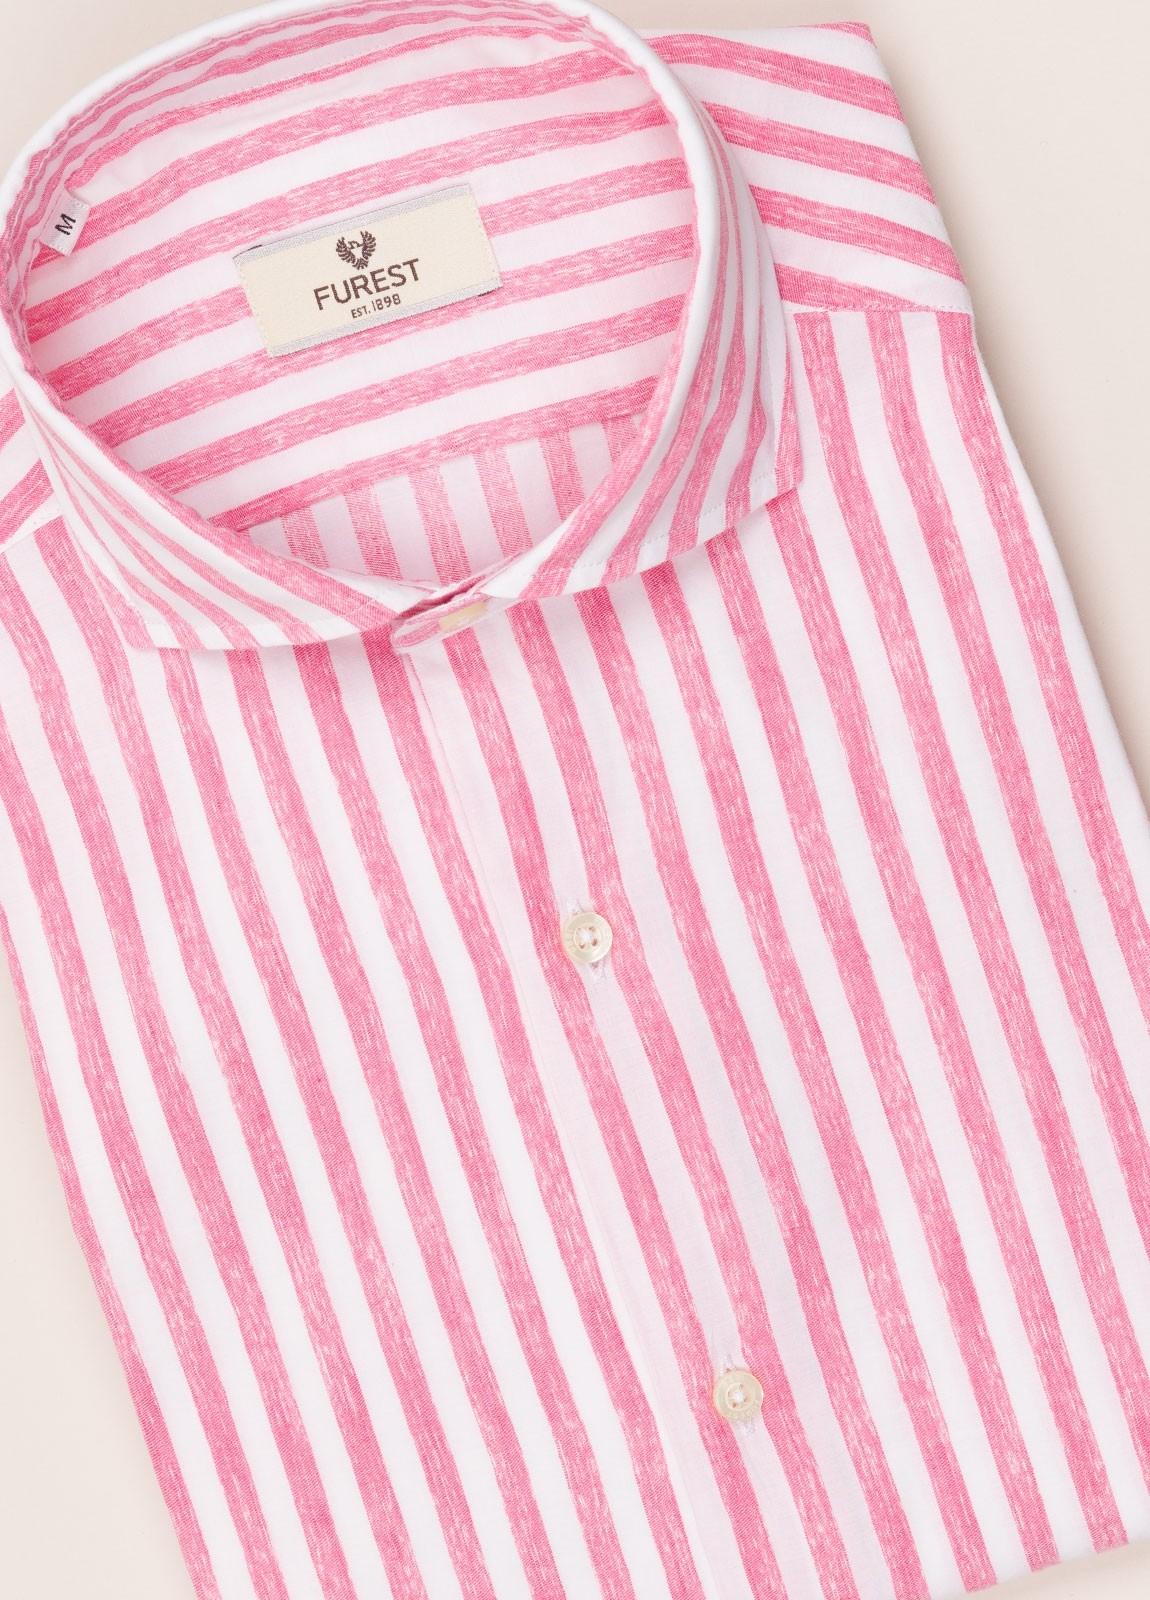 Camisa sport FUREST COLECCIÓN slim fit rayas rosa - Ítem2